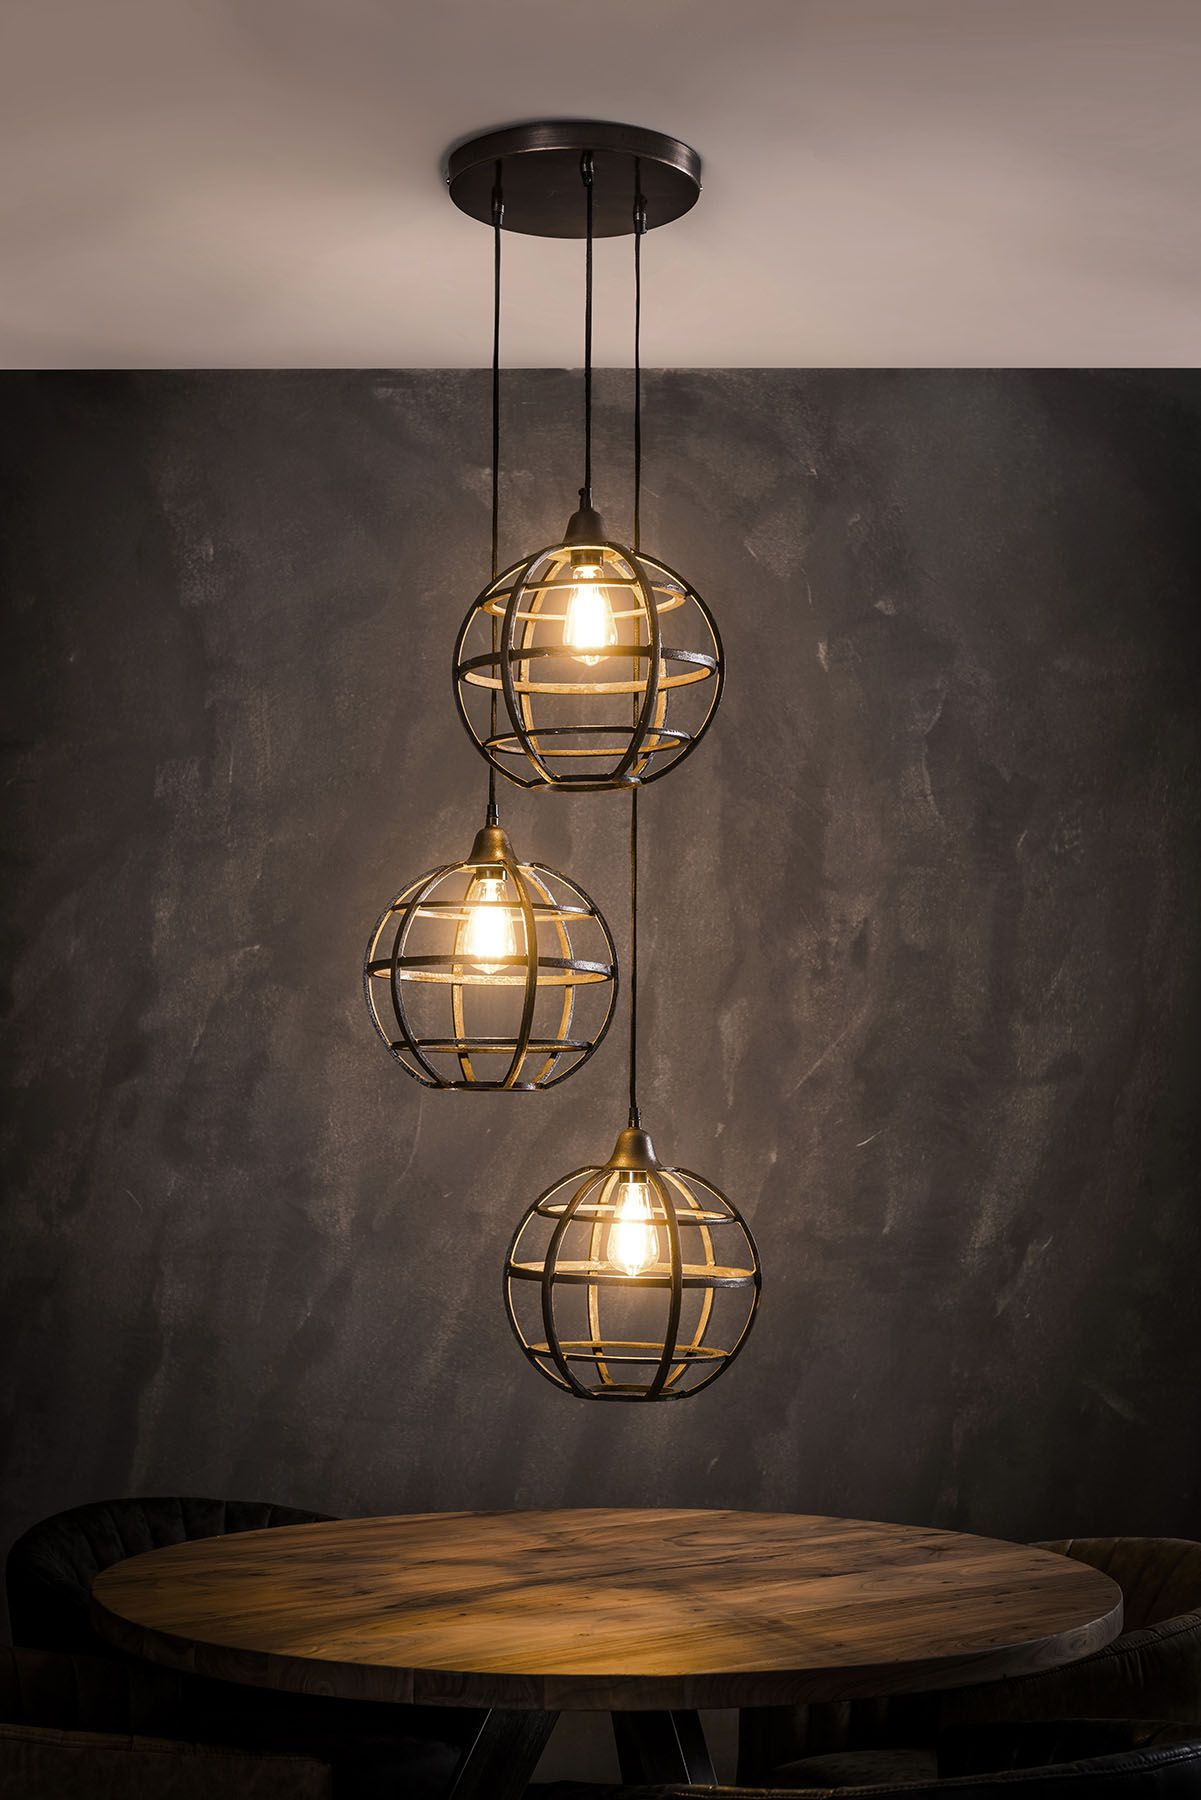 Hangelampe Globus Lampen Retro Tischlampen Esszimmer Kronleuchter